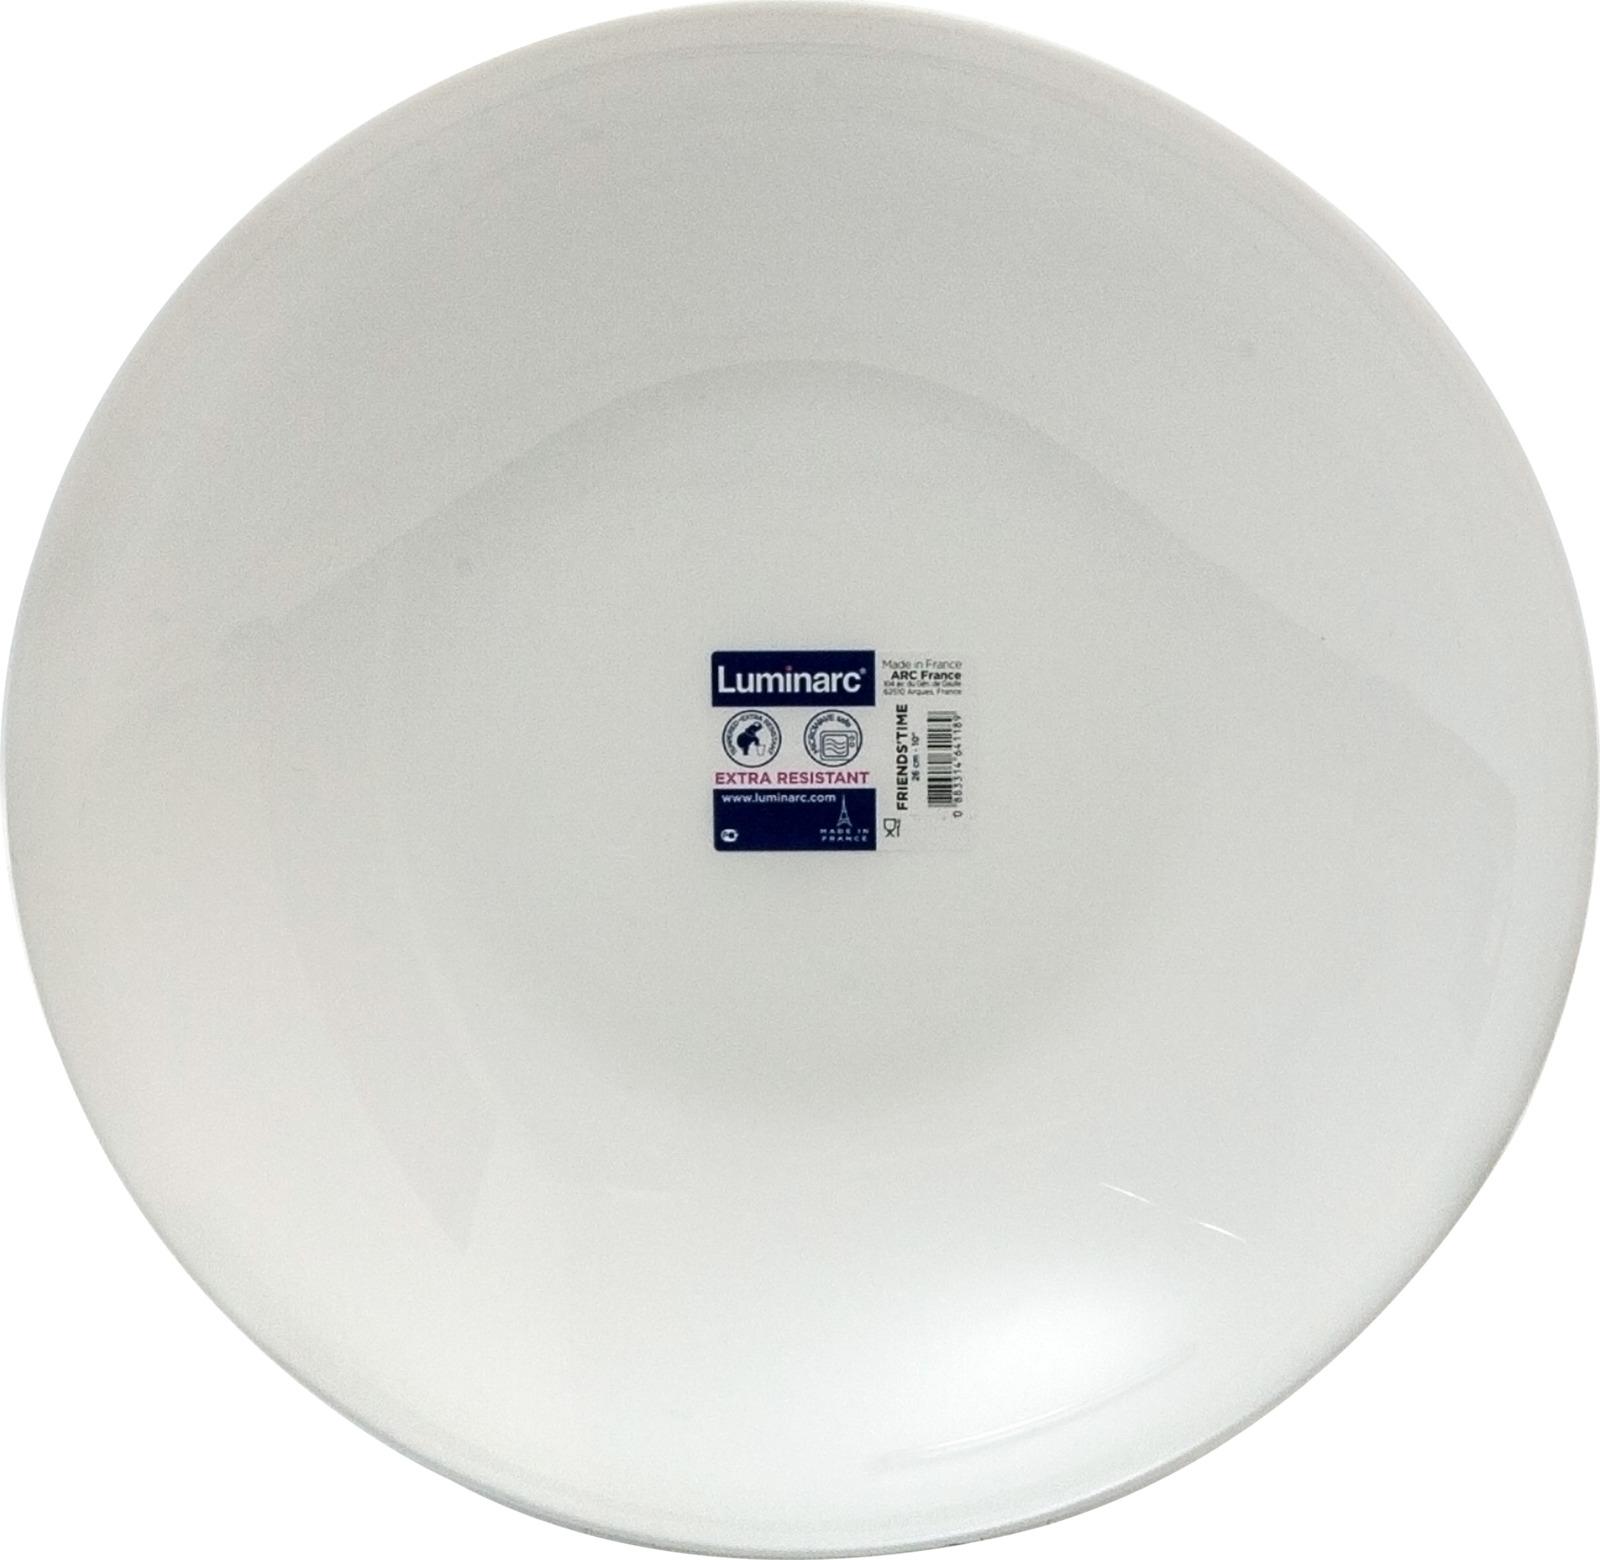 Блюдо Luminarc Френдс Тайм, N3186, диаметр 26 см блюдо д пасты luminarc френдс тайм блэк декор кругл 29см стекло